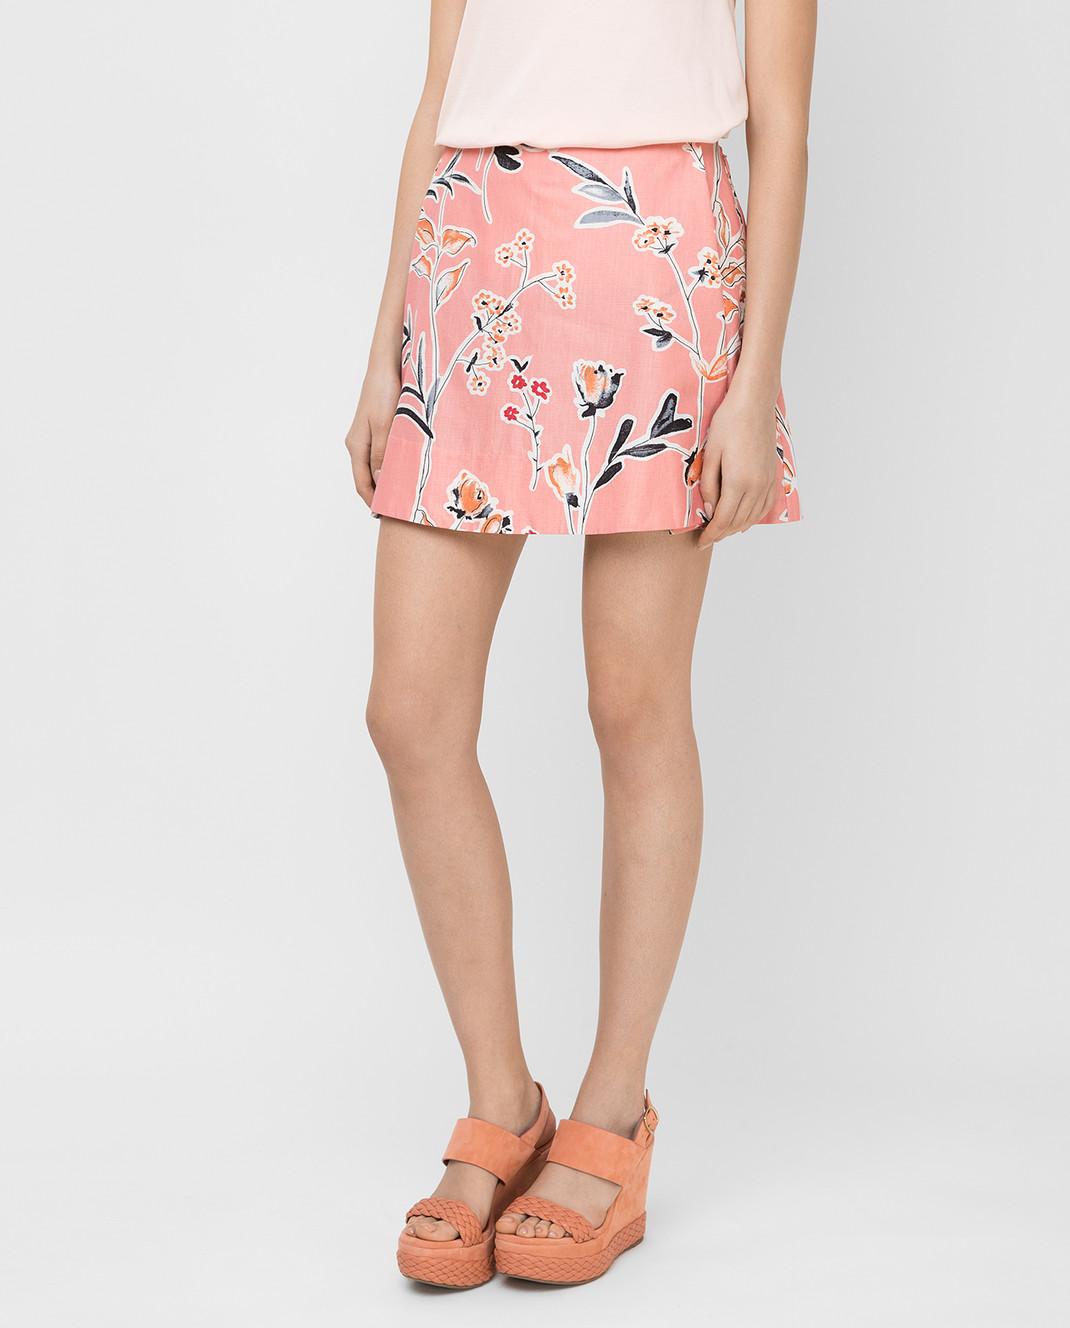 Marni Розовая юбка GOMAR35A00TCR58 изображение 3